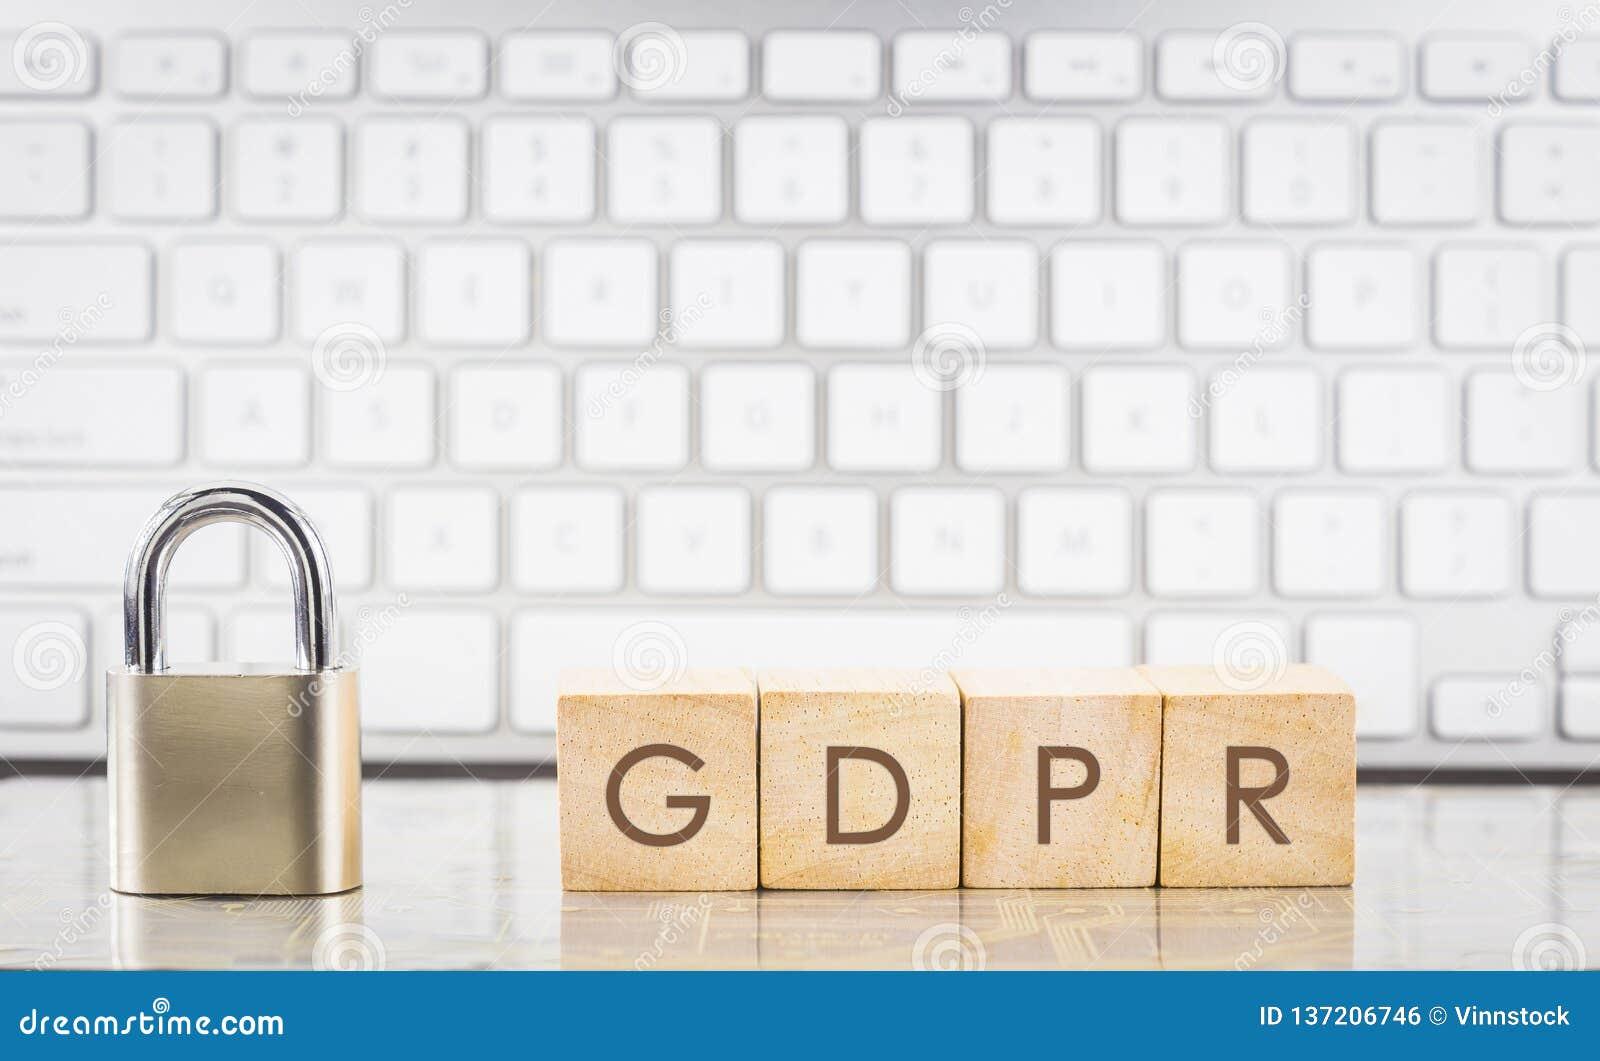 Close key lock with word GDPR, keyboard background